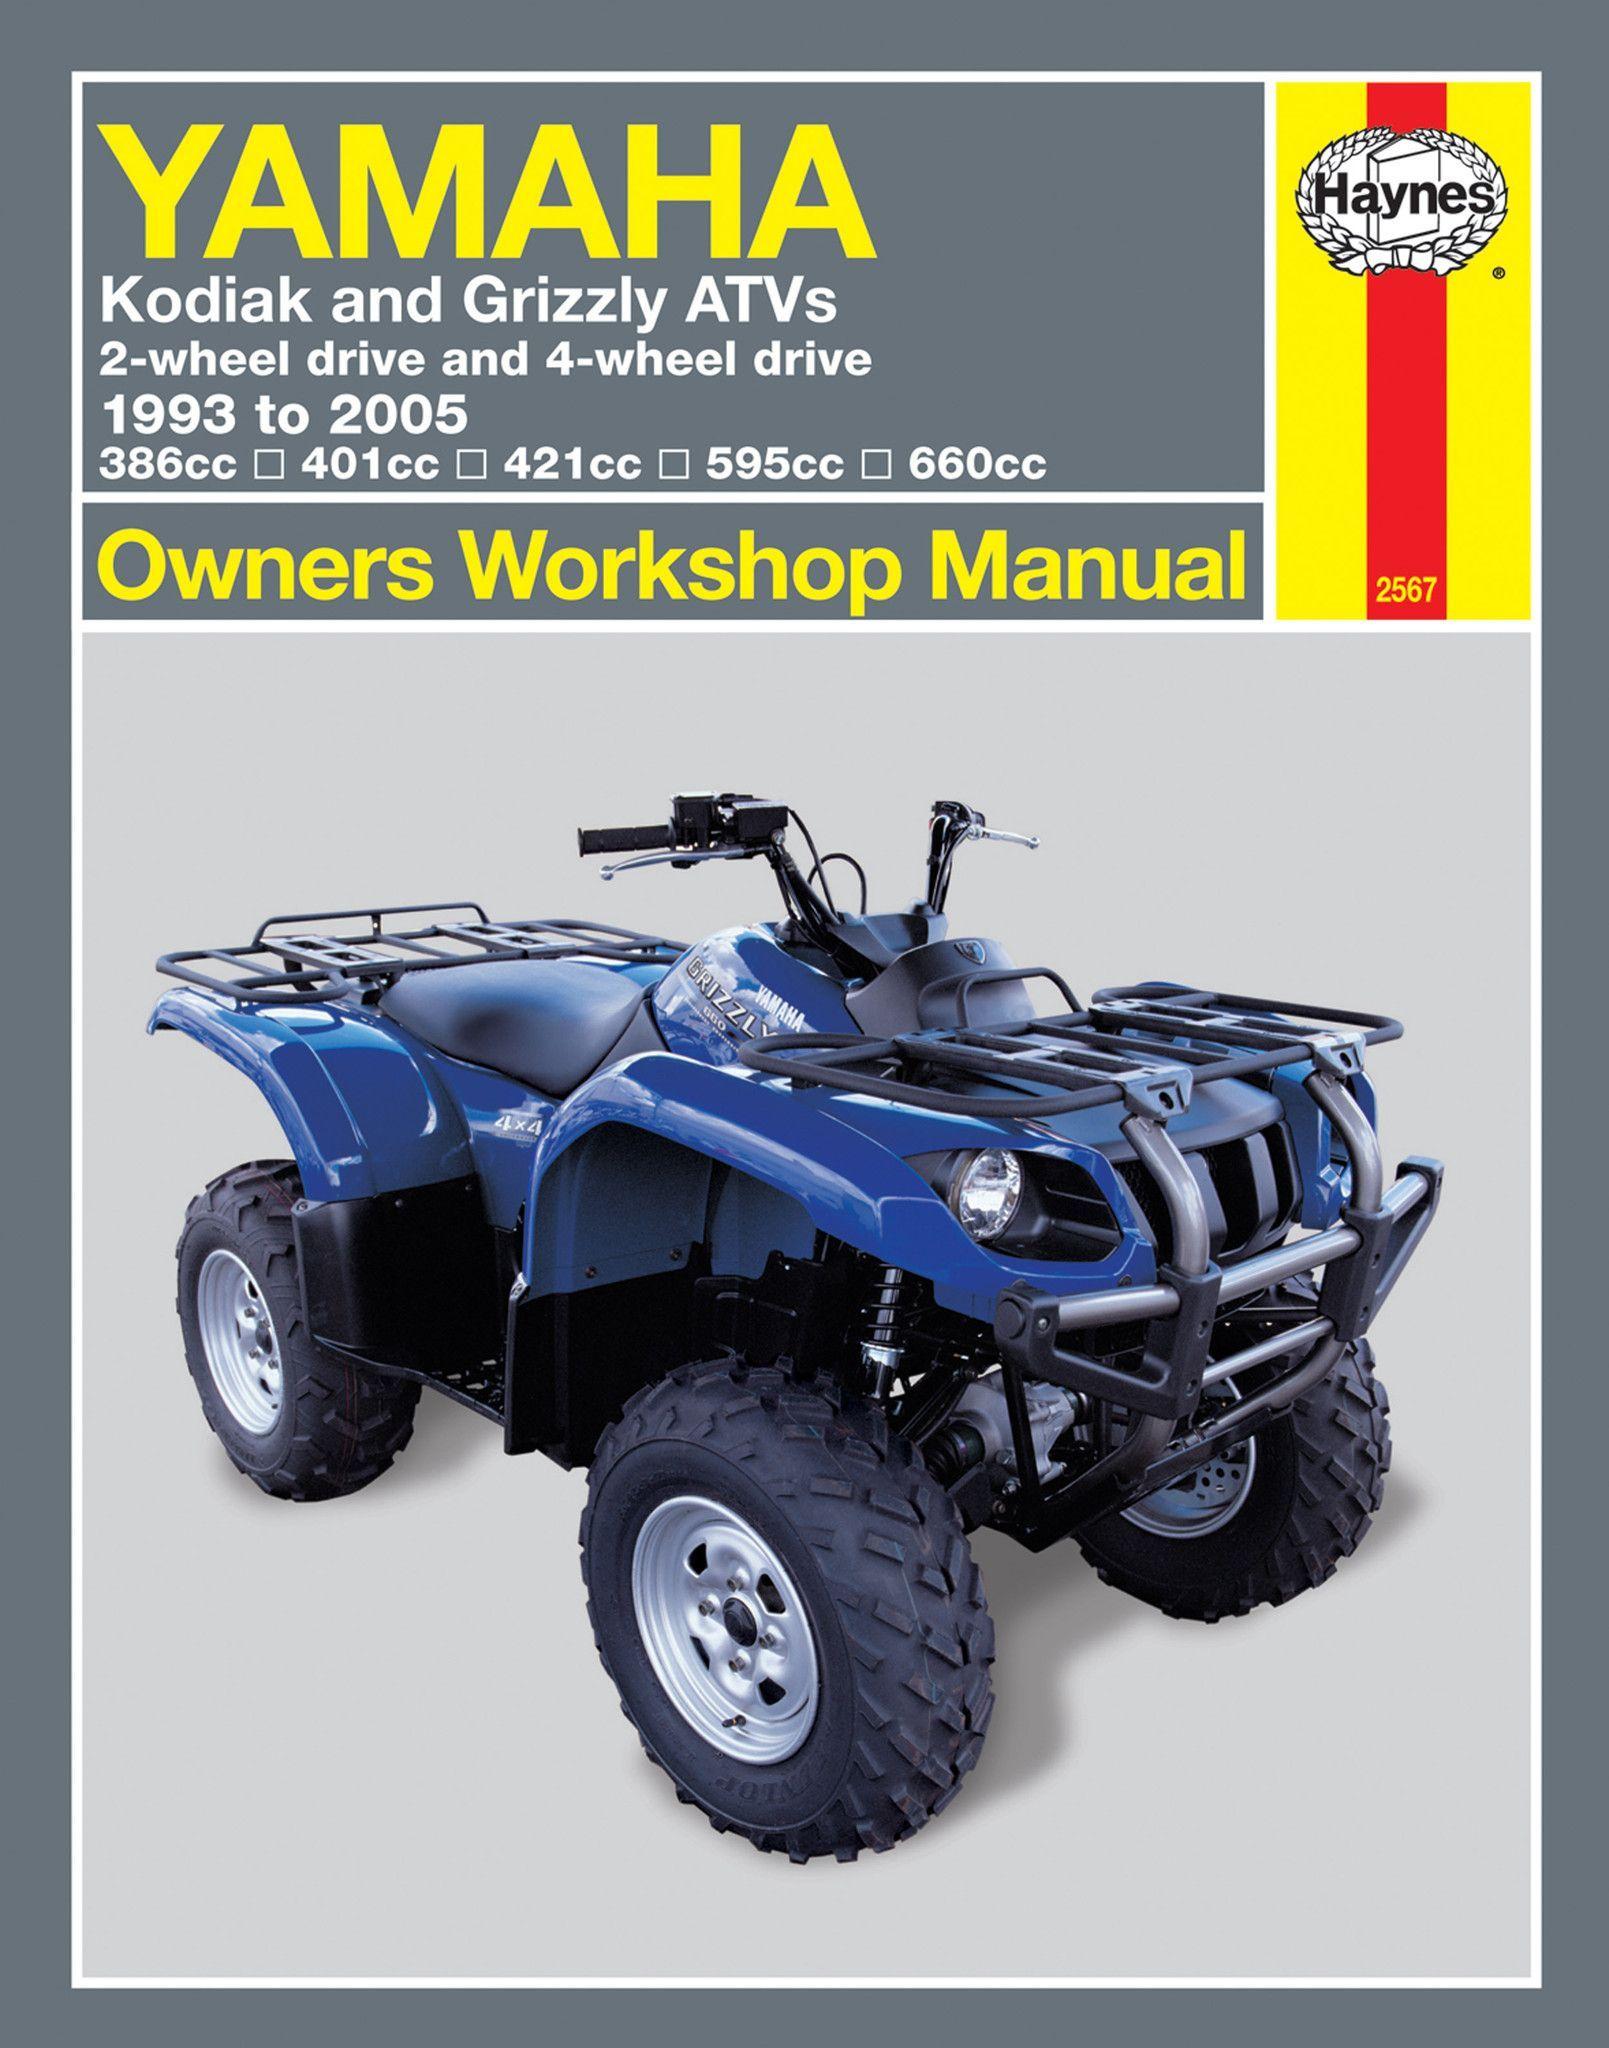 Haynes m2567 repair manual for 1993 05 yamaha kodiak grizzly haynes m2567 repair manual for 1993 05 yamaha kodiak grizzly 2x4 4x4 solutioingenieria Gallery